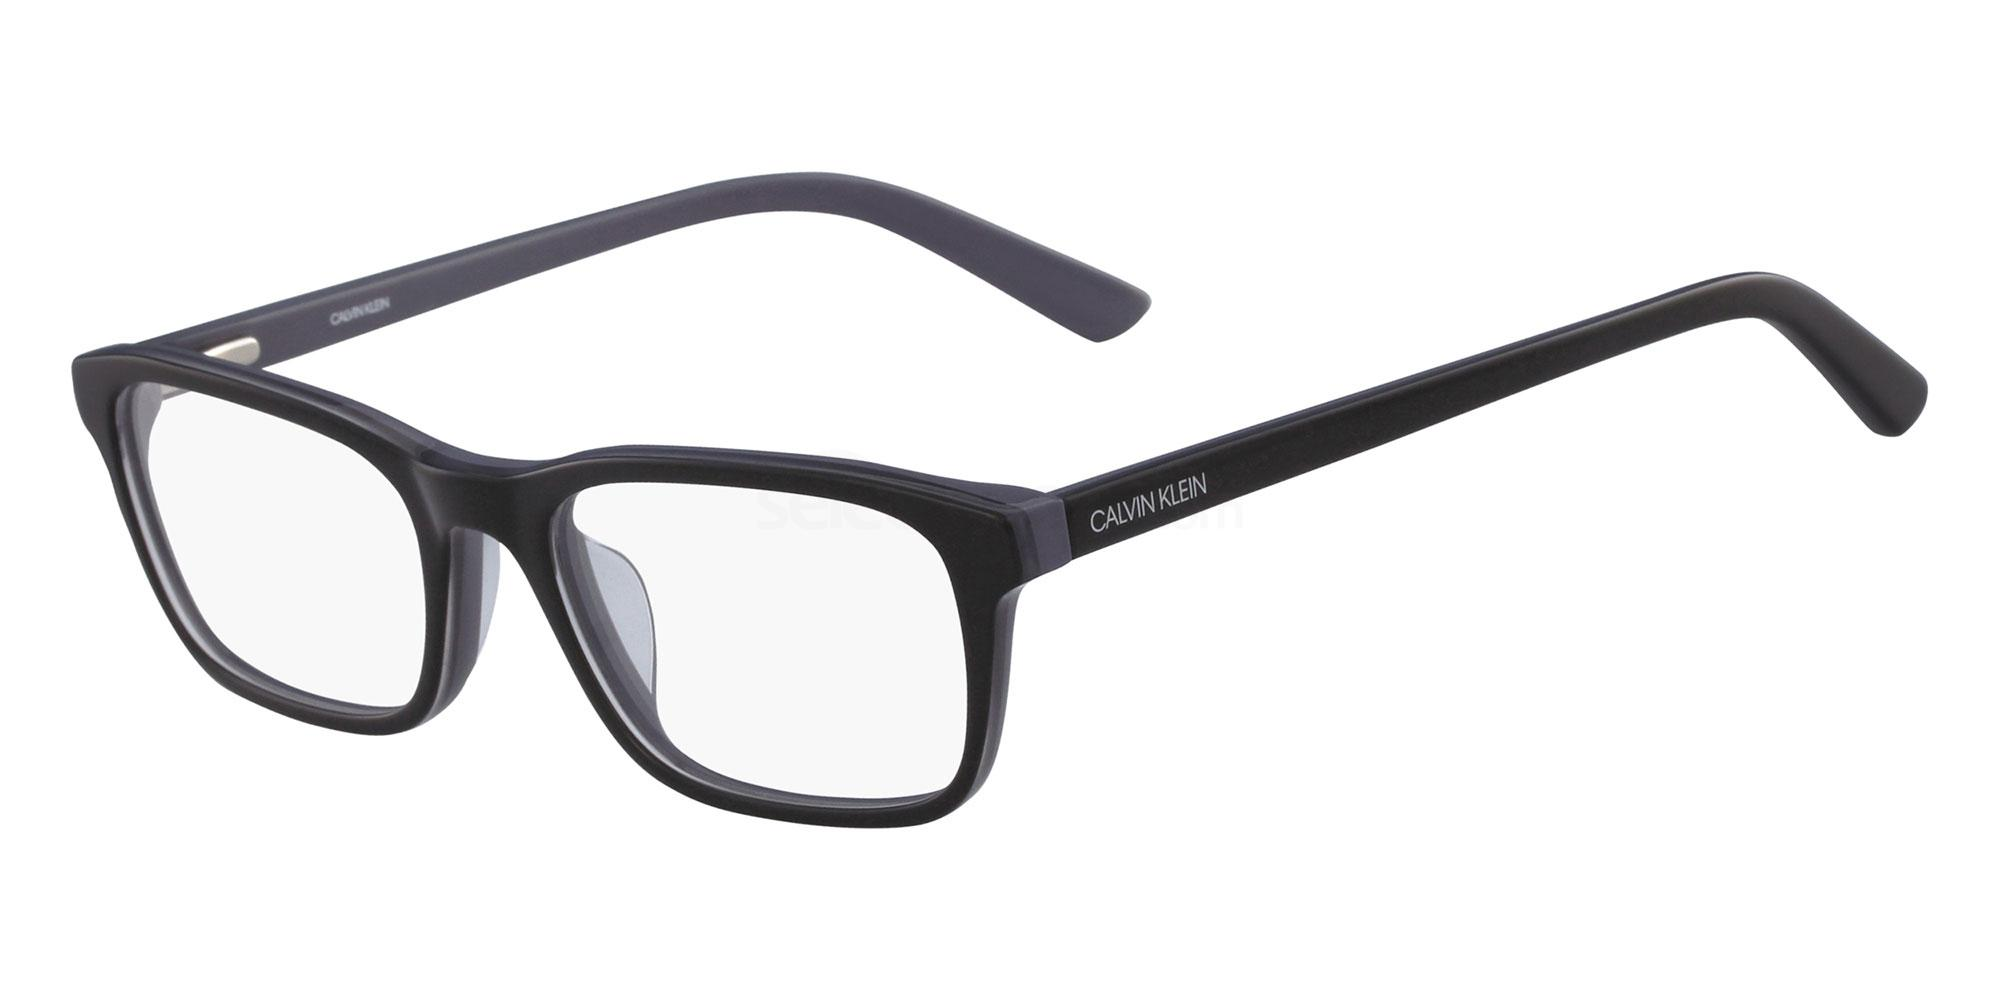 032 CK18516 Glasses, Calvin Klein